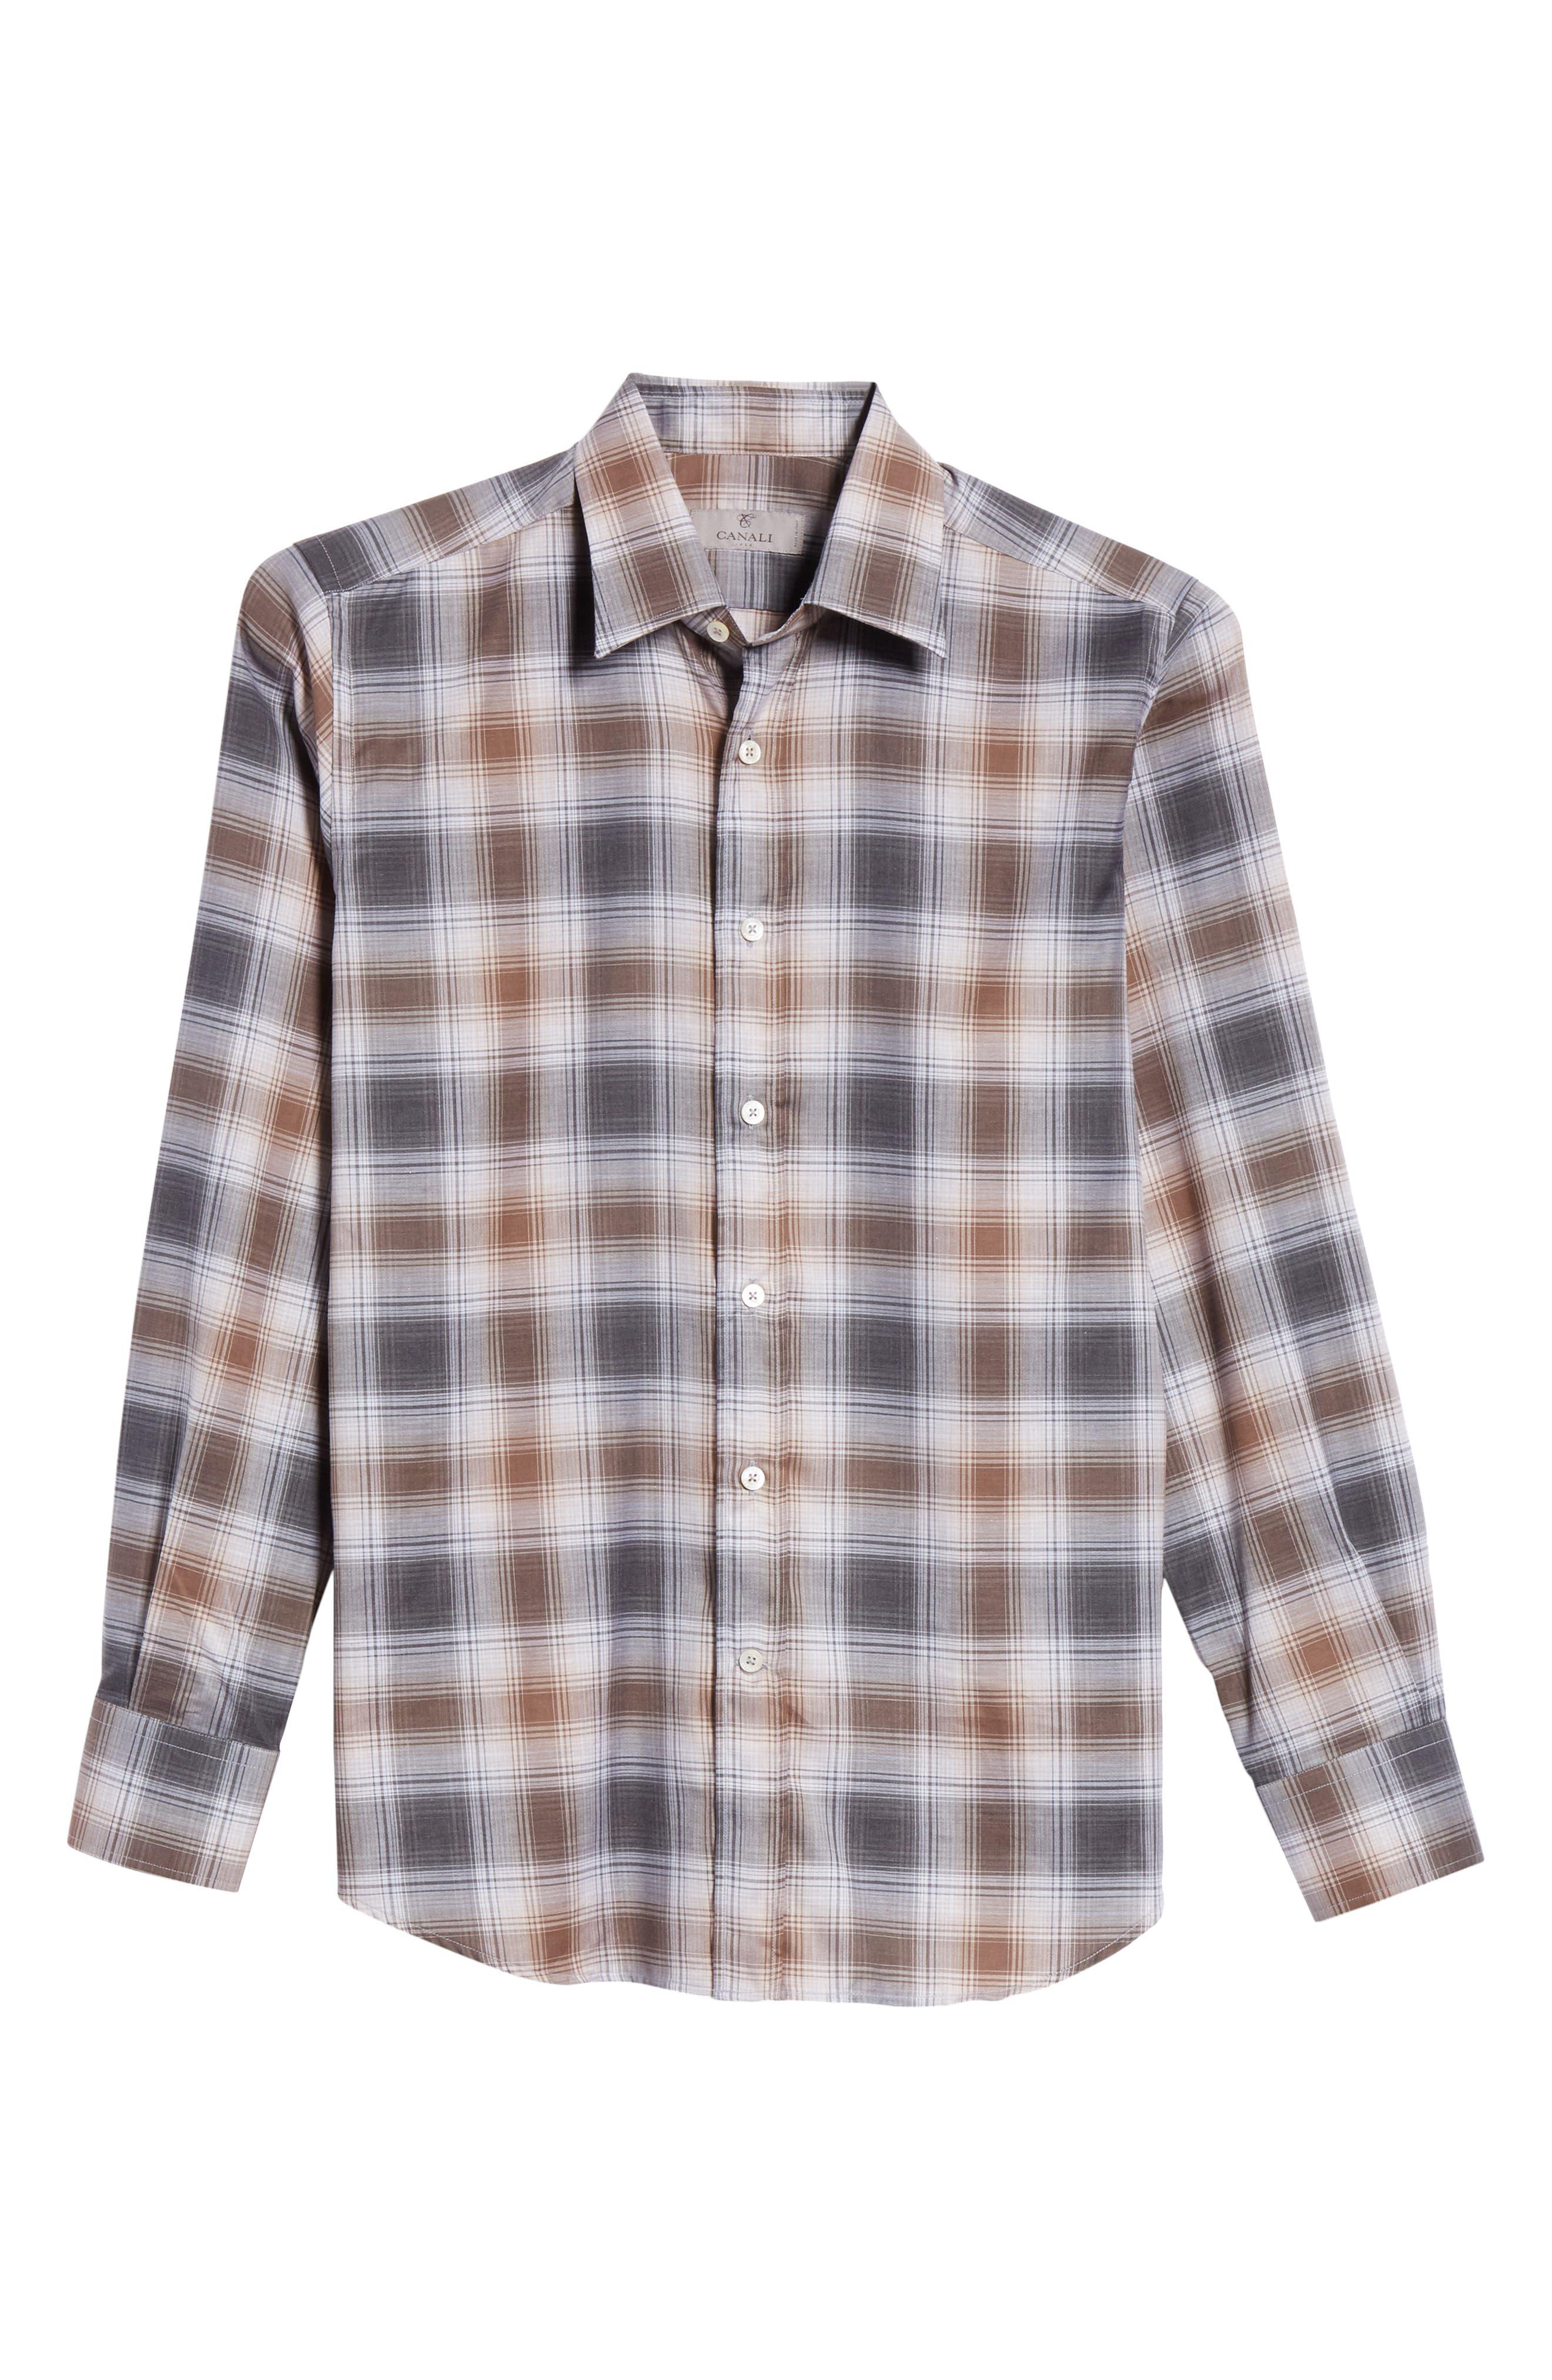 Regular Fit Plaid Dress Shirt,                             Alternate thumbnail 6, color,                             BROWN